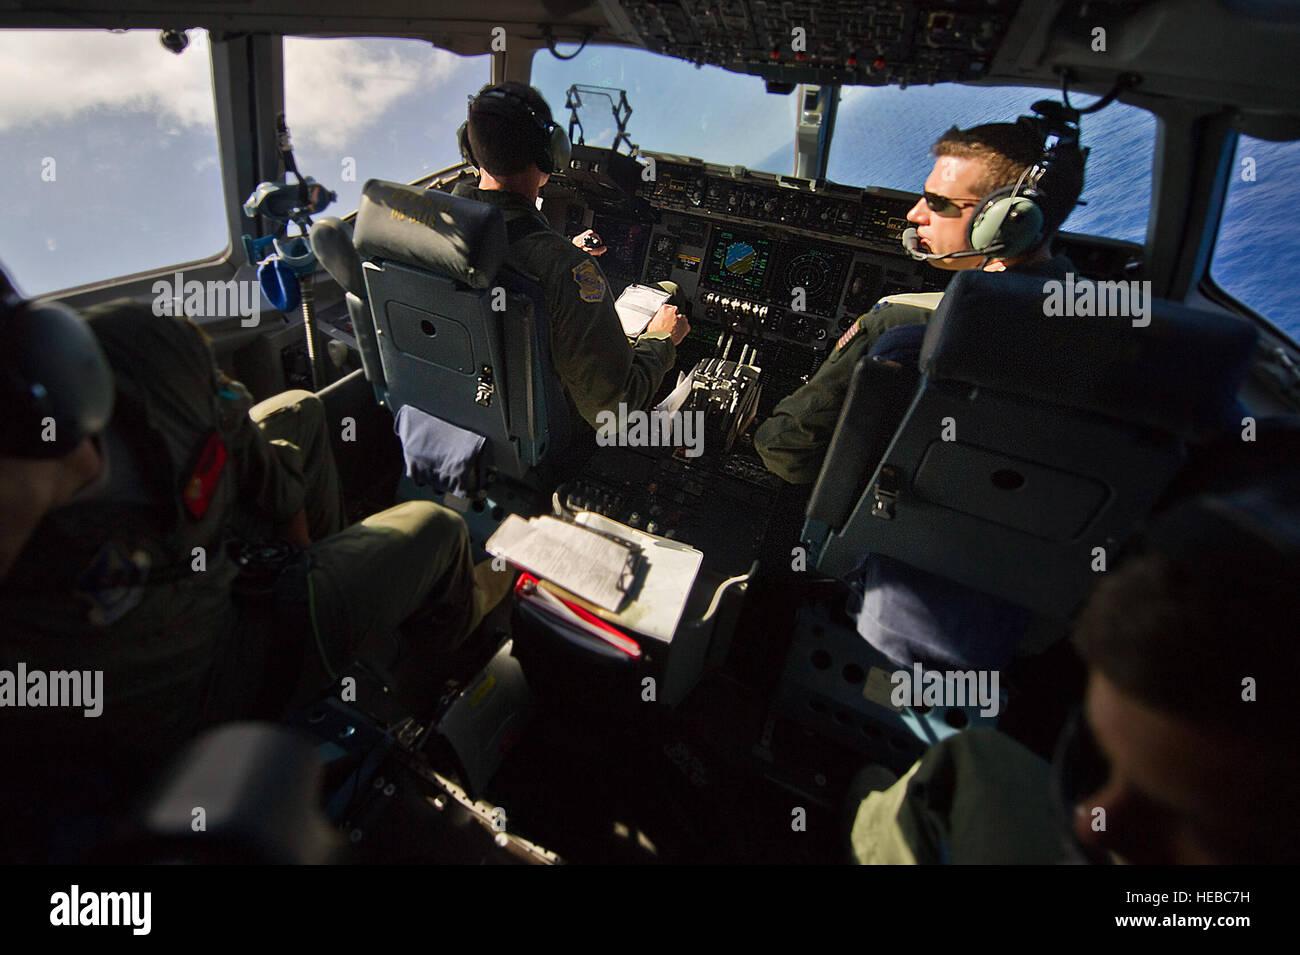 U.S. Air Force Capt. Brian Pollock, 535th Air Lift Squadron, C-17 Globemaster III pilot, flies a combat training - Stock Image